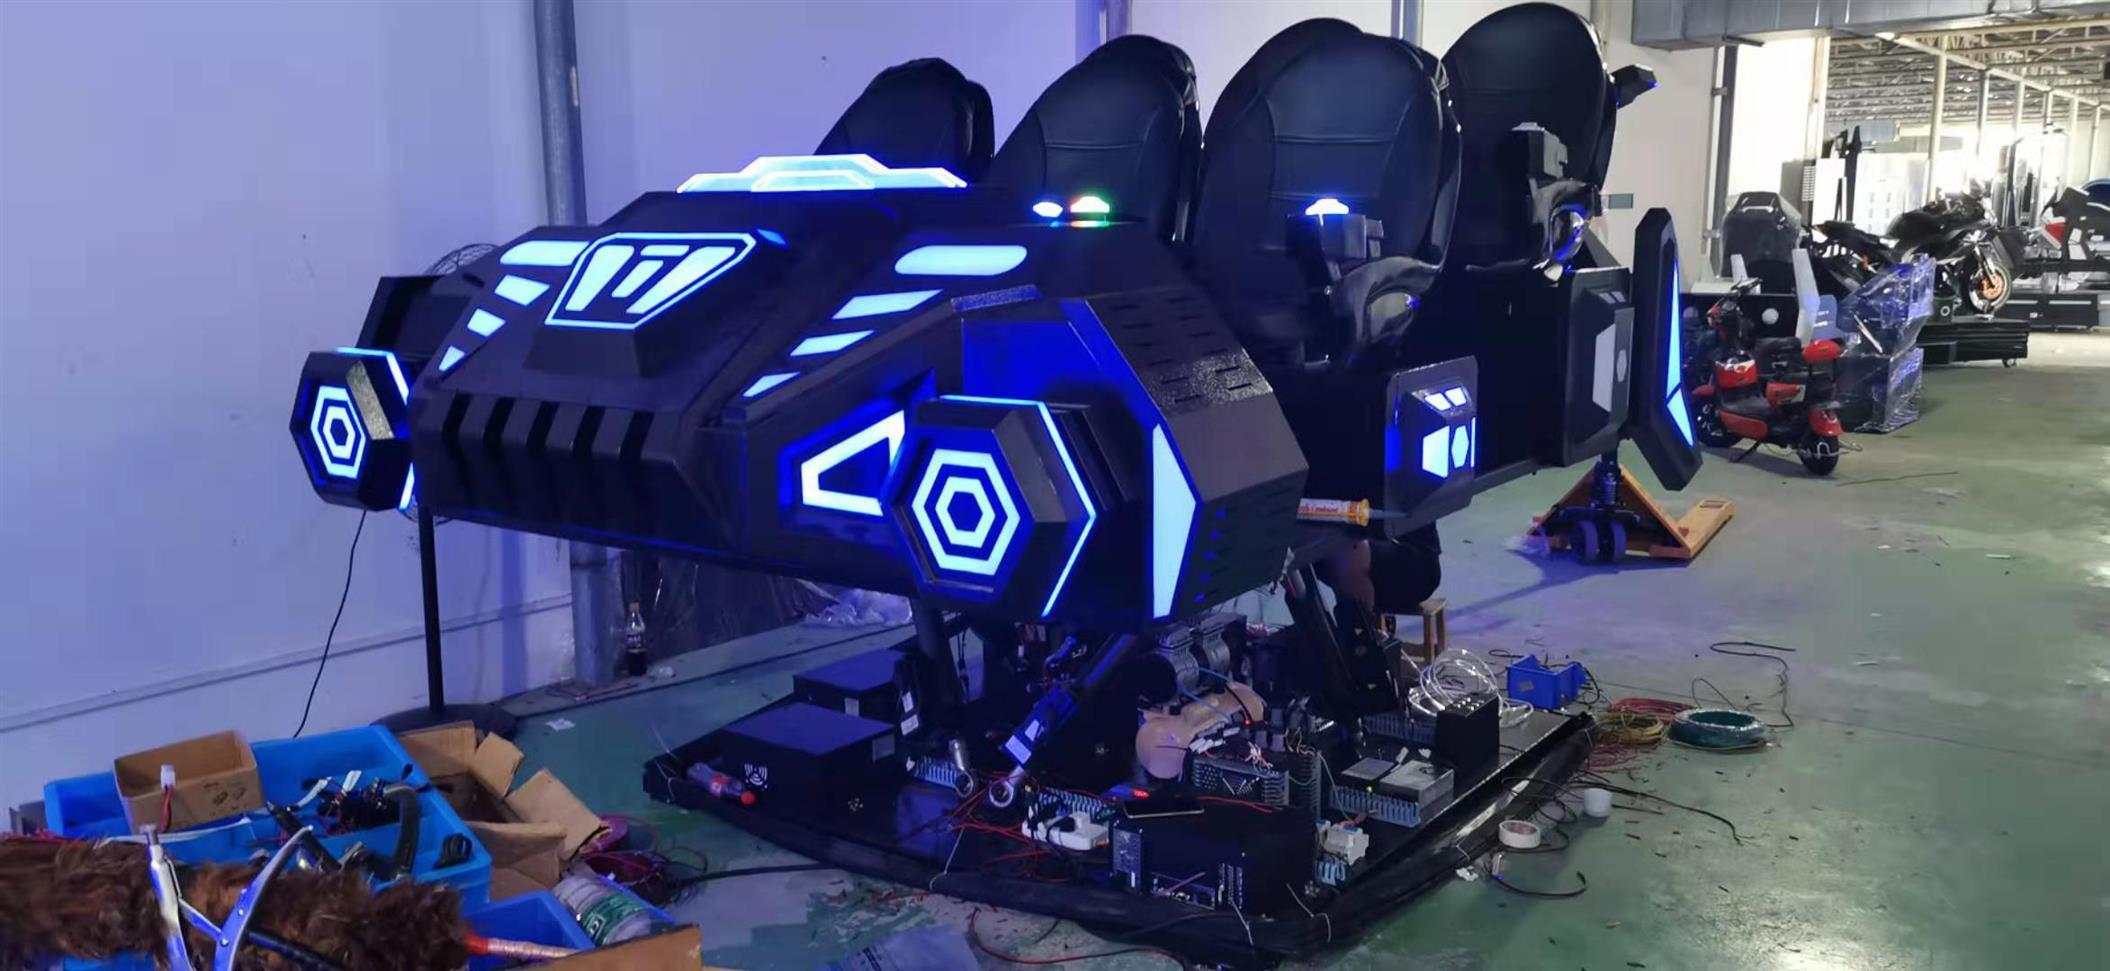 VR六人飛船 個性定制 價格實惠 三辰科技